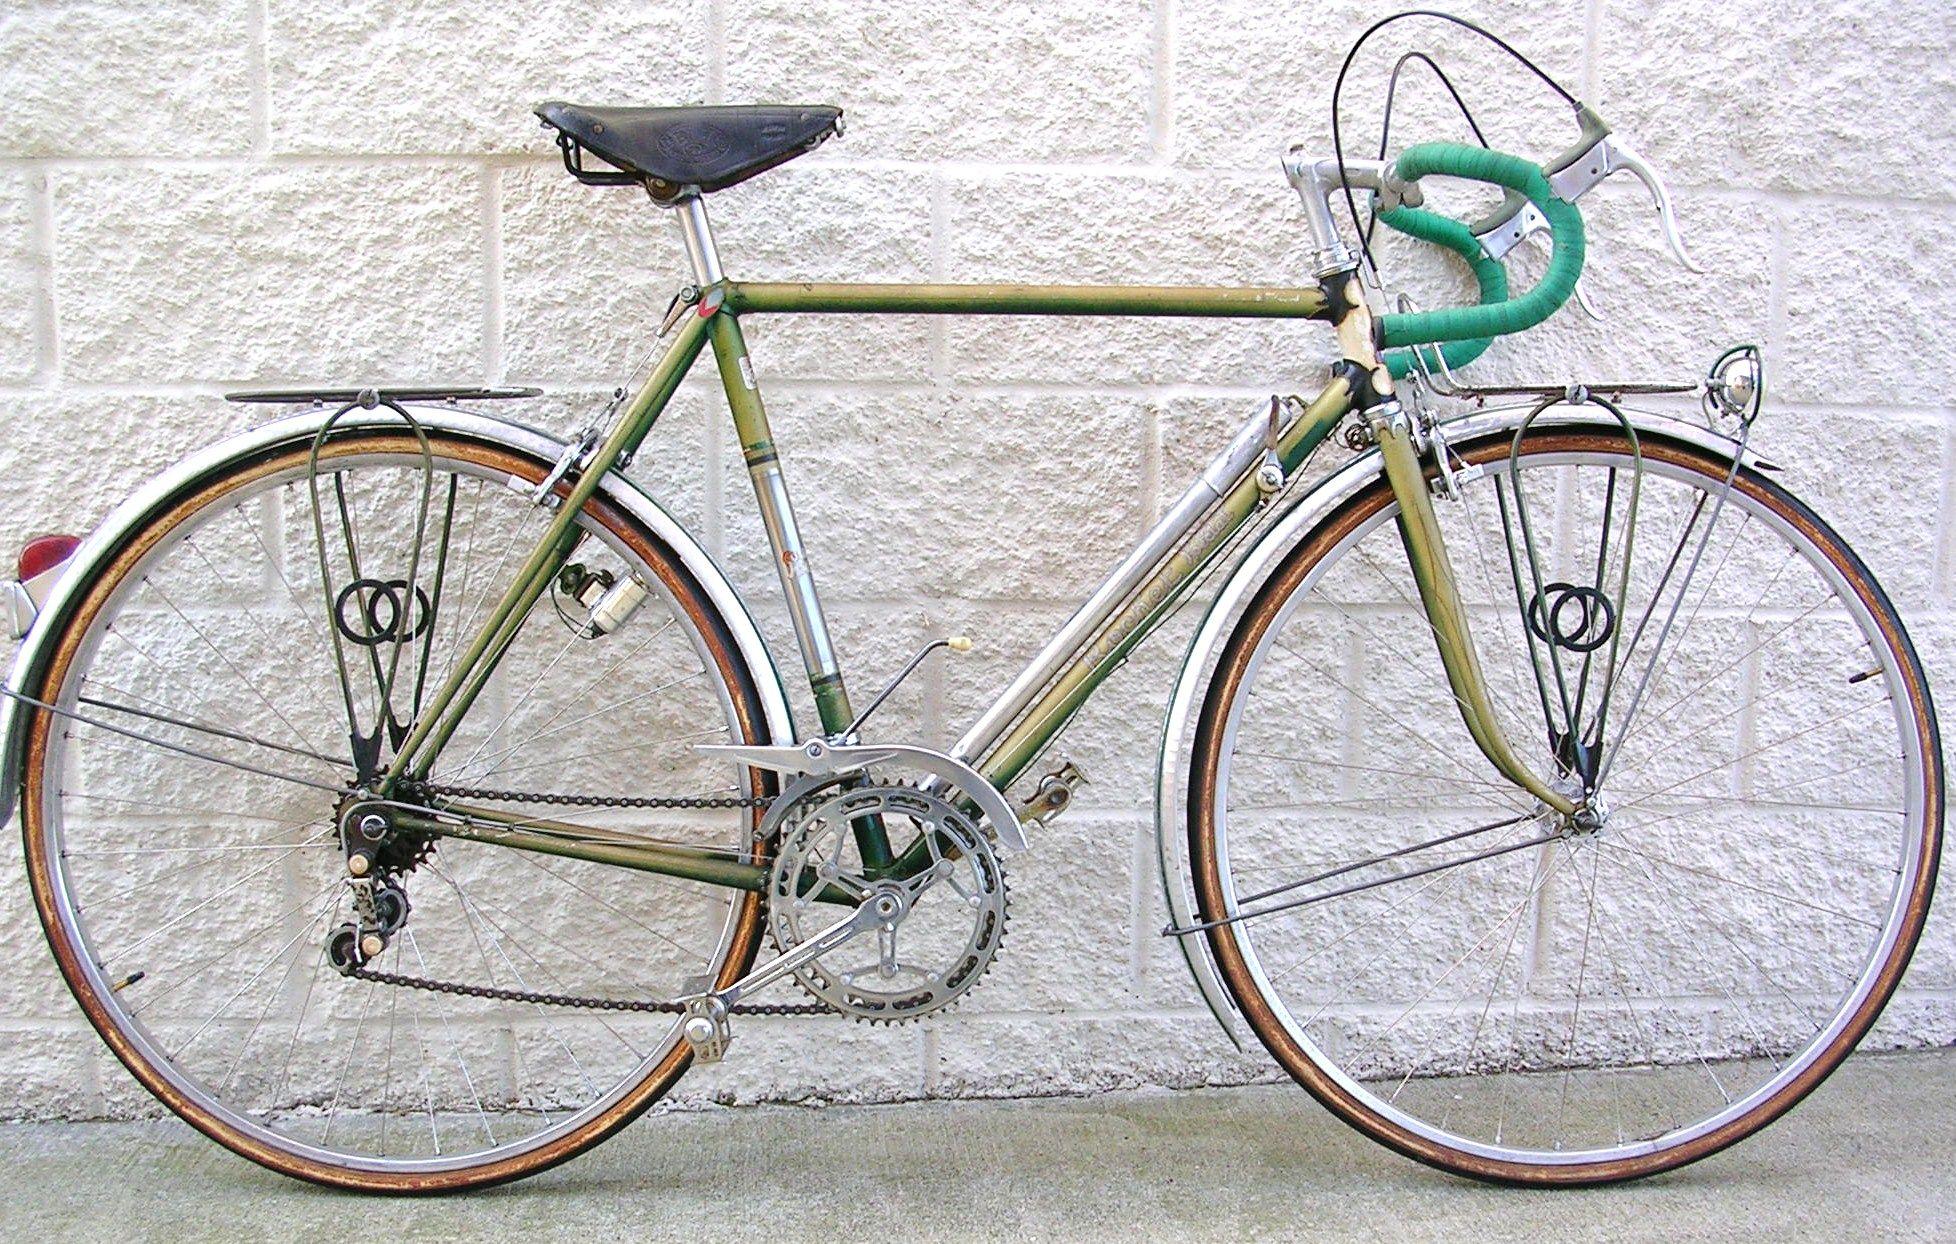 1950s Rochet Touring Bike Classic Cycle Bainbridge Island Kitsap County Touring Bike Bike Bicycle